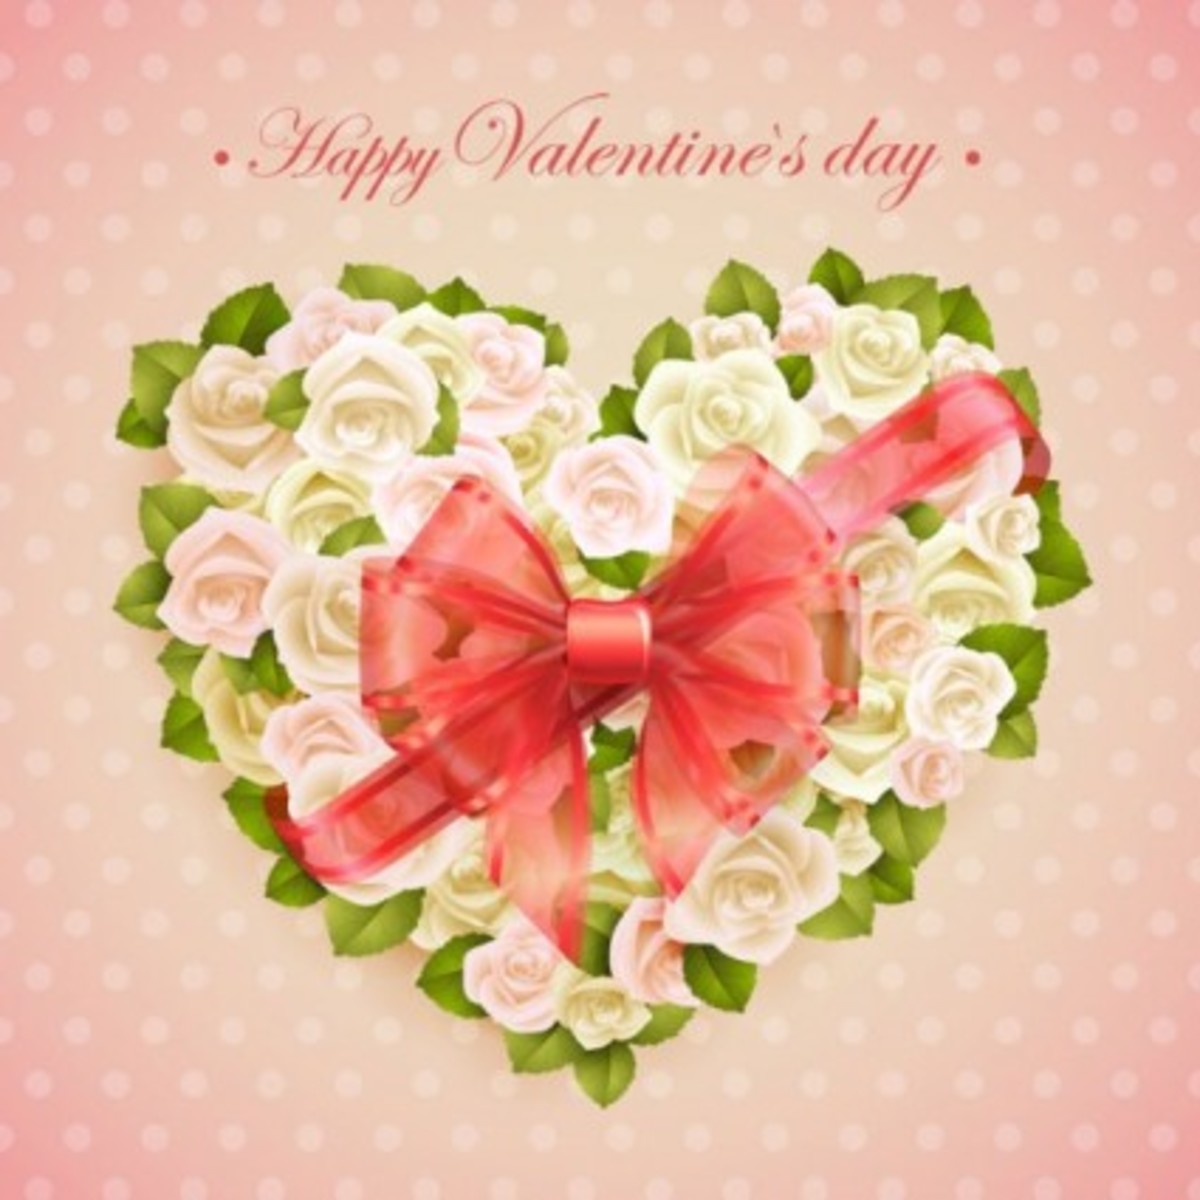 Happy Valentine's Day with Roses Wreathe